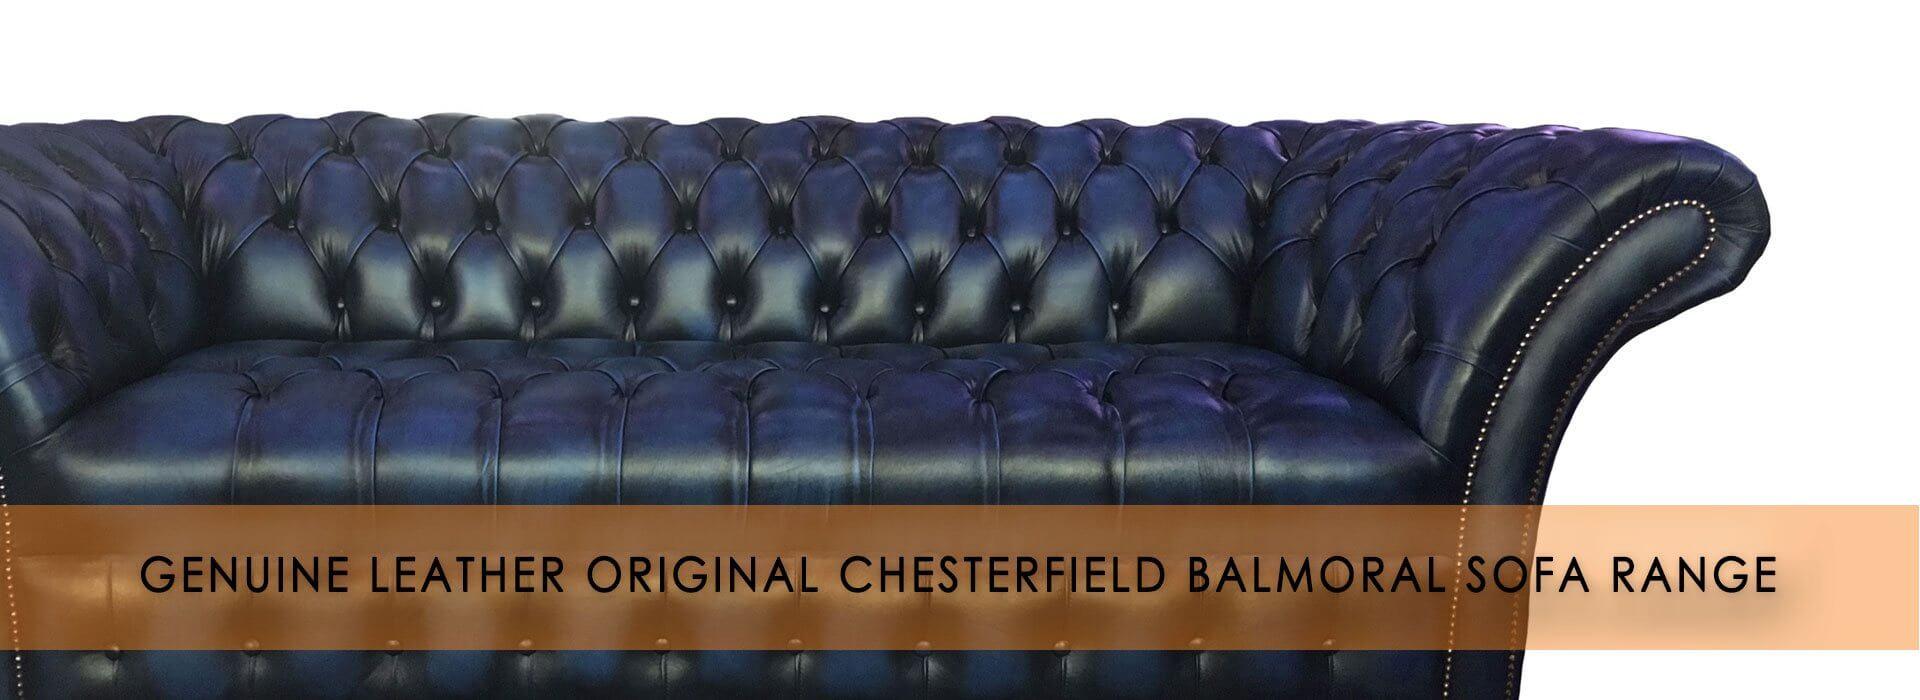 Balmoral Sofa Range